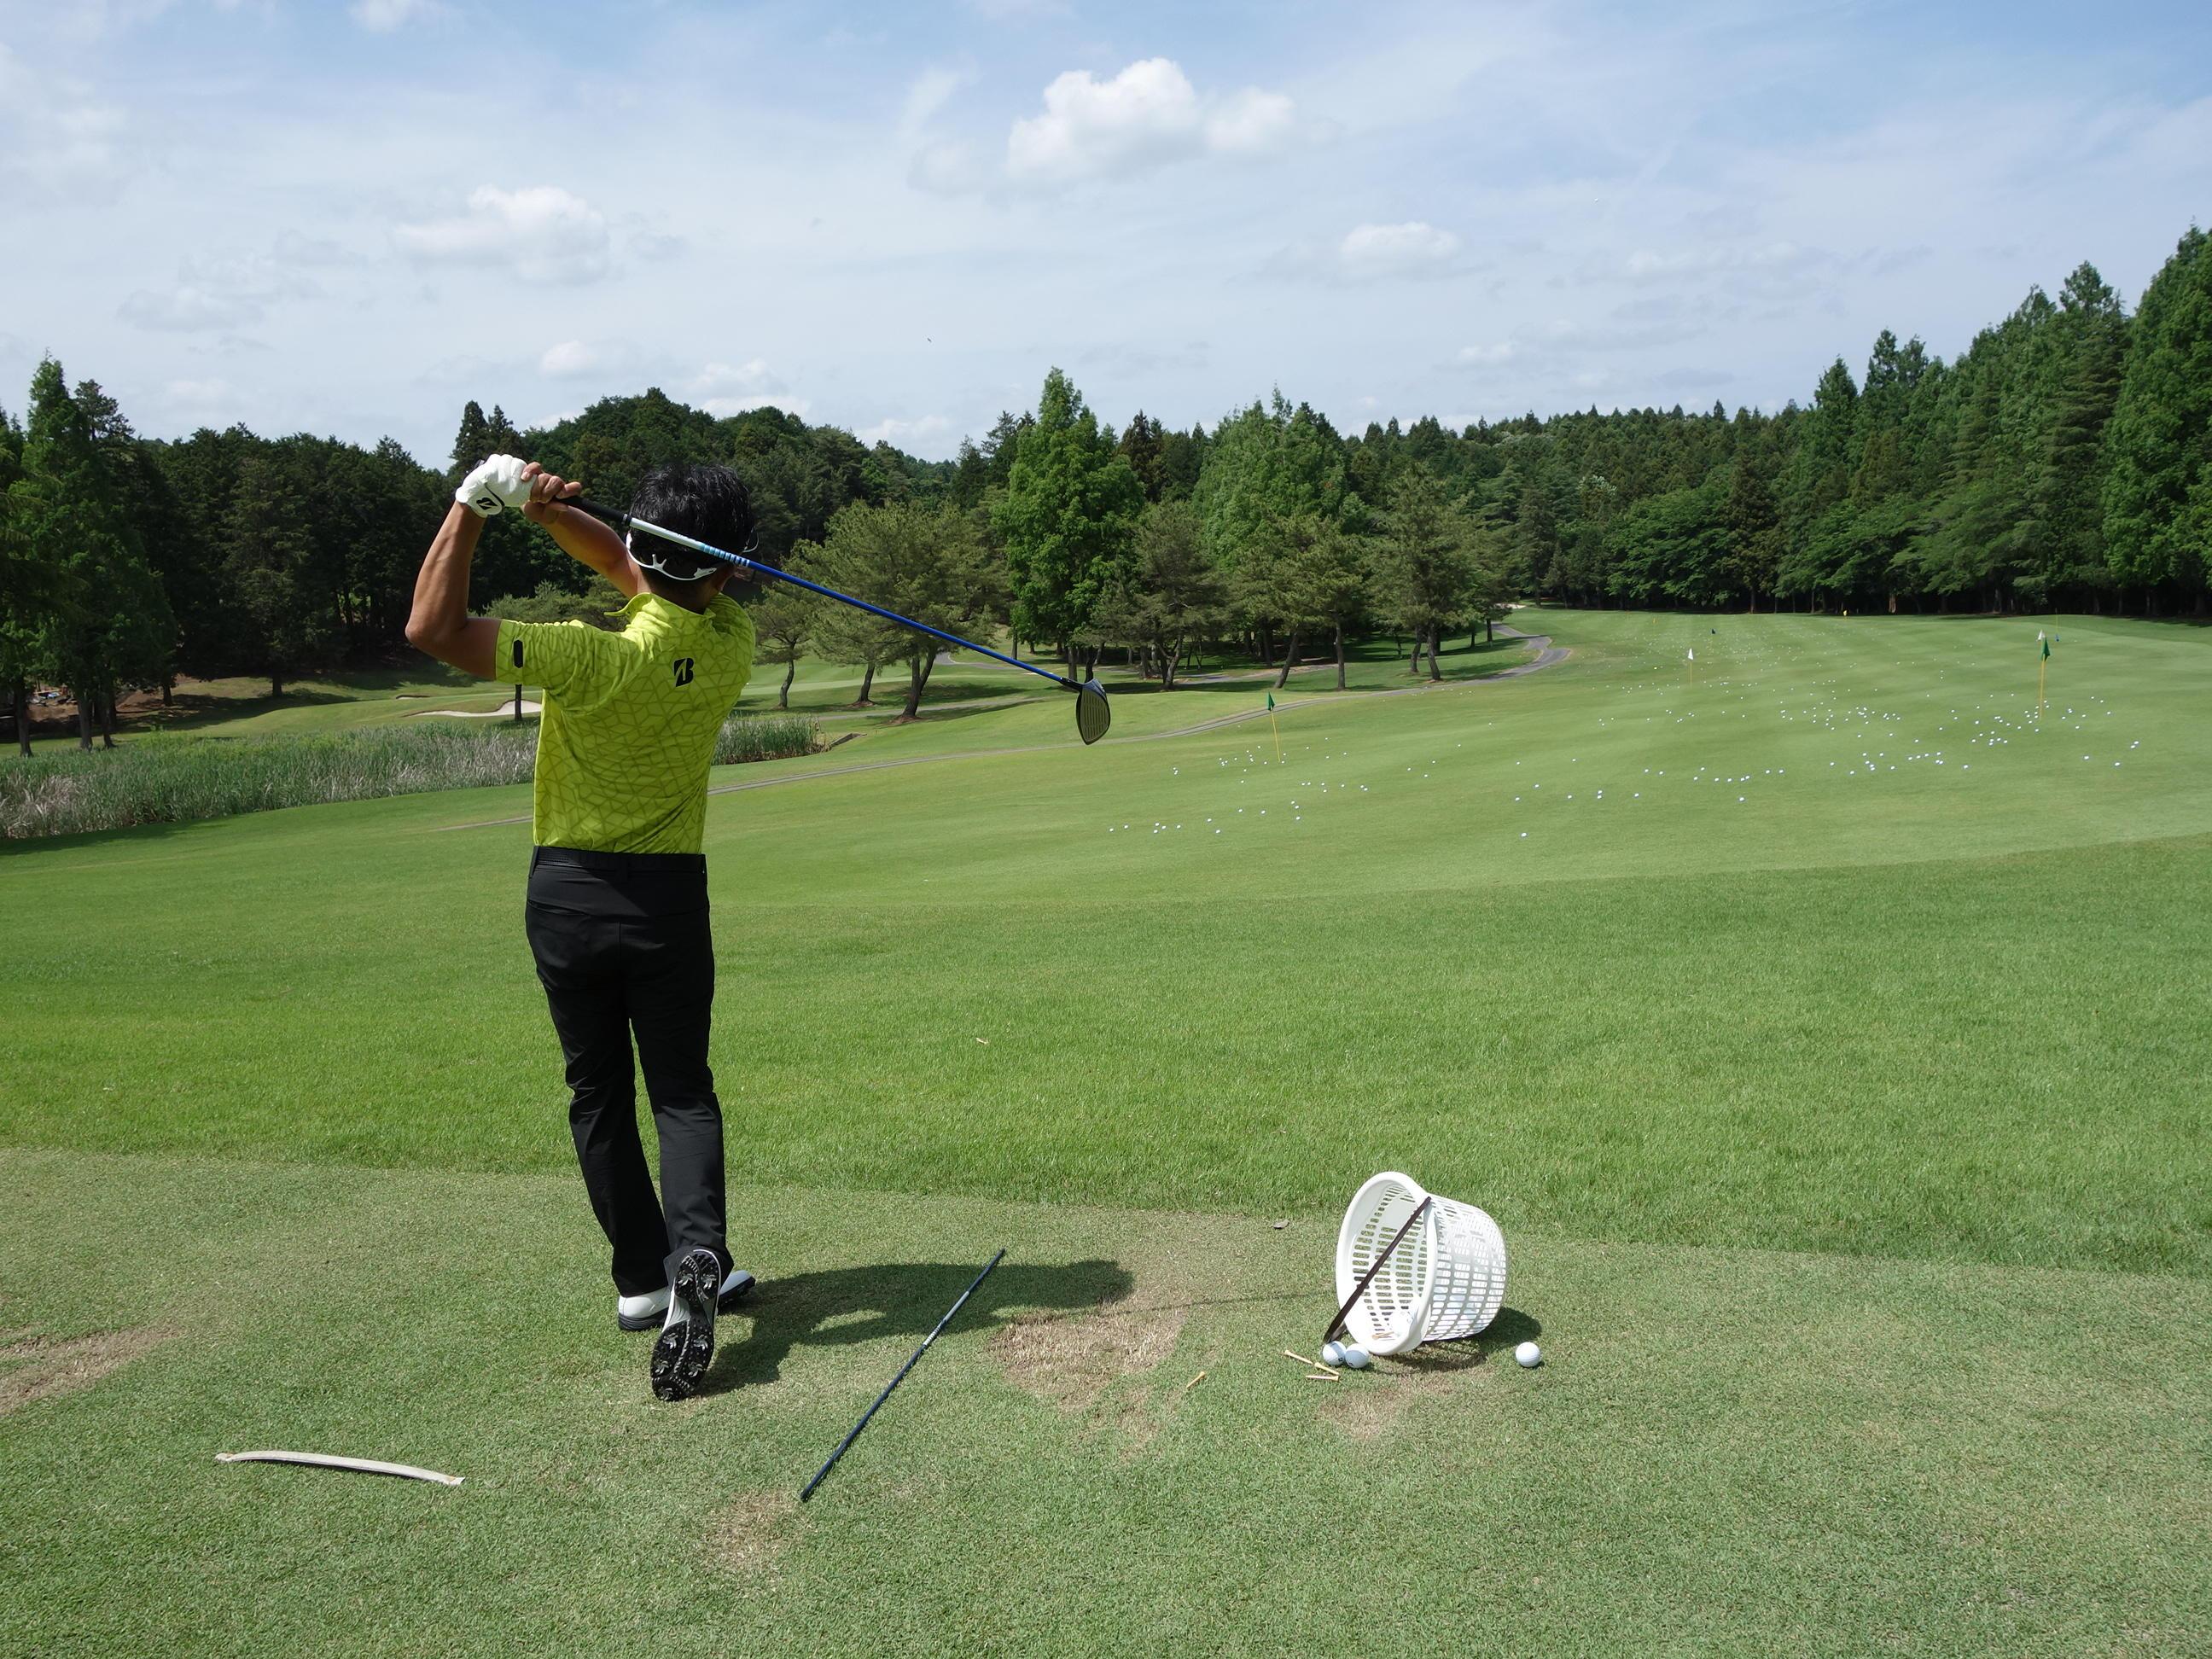 https://www.bs-golf.com/pro/77fe3d676d9258f1019ead0054482c2630cb67bf.JPG